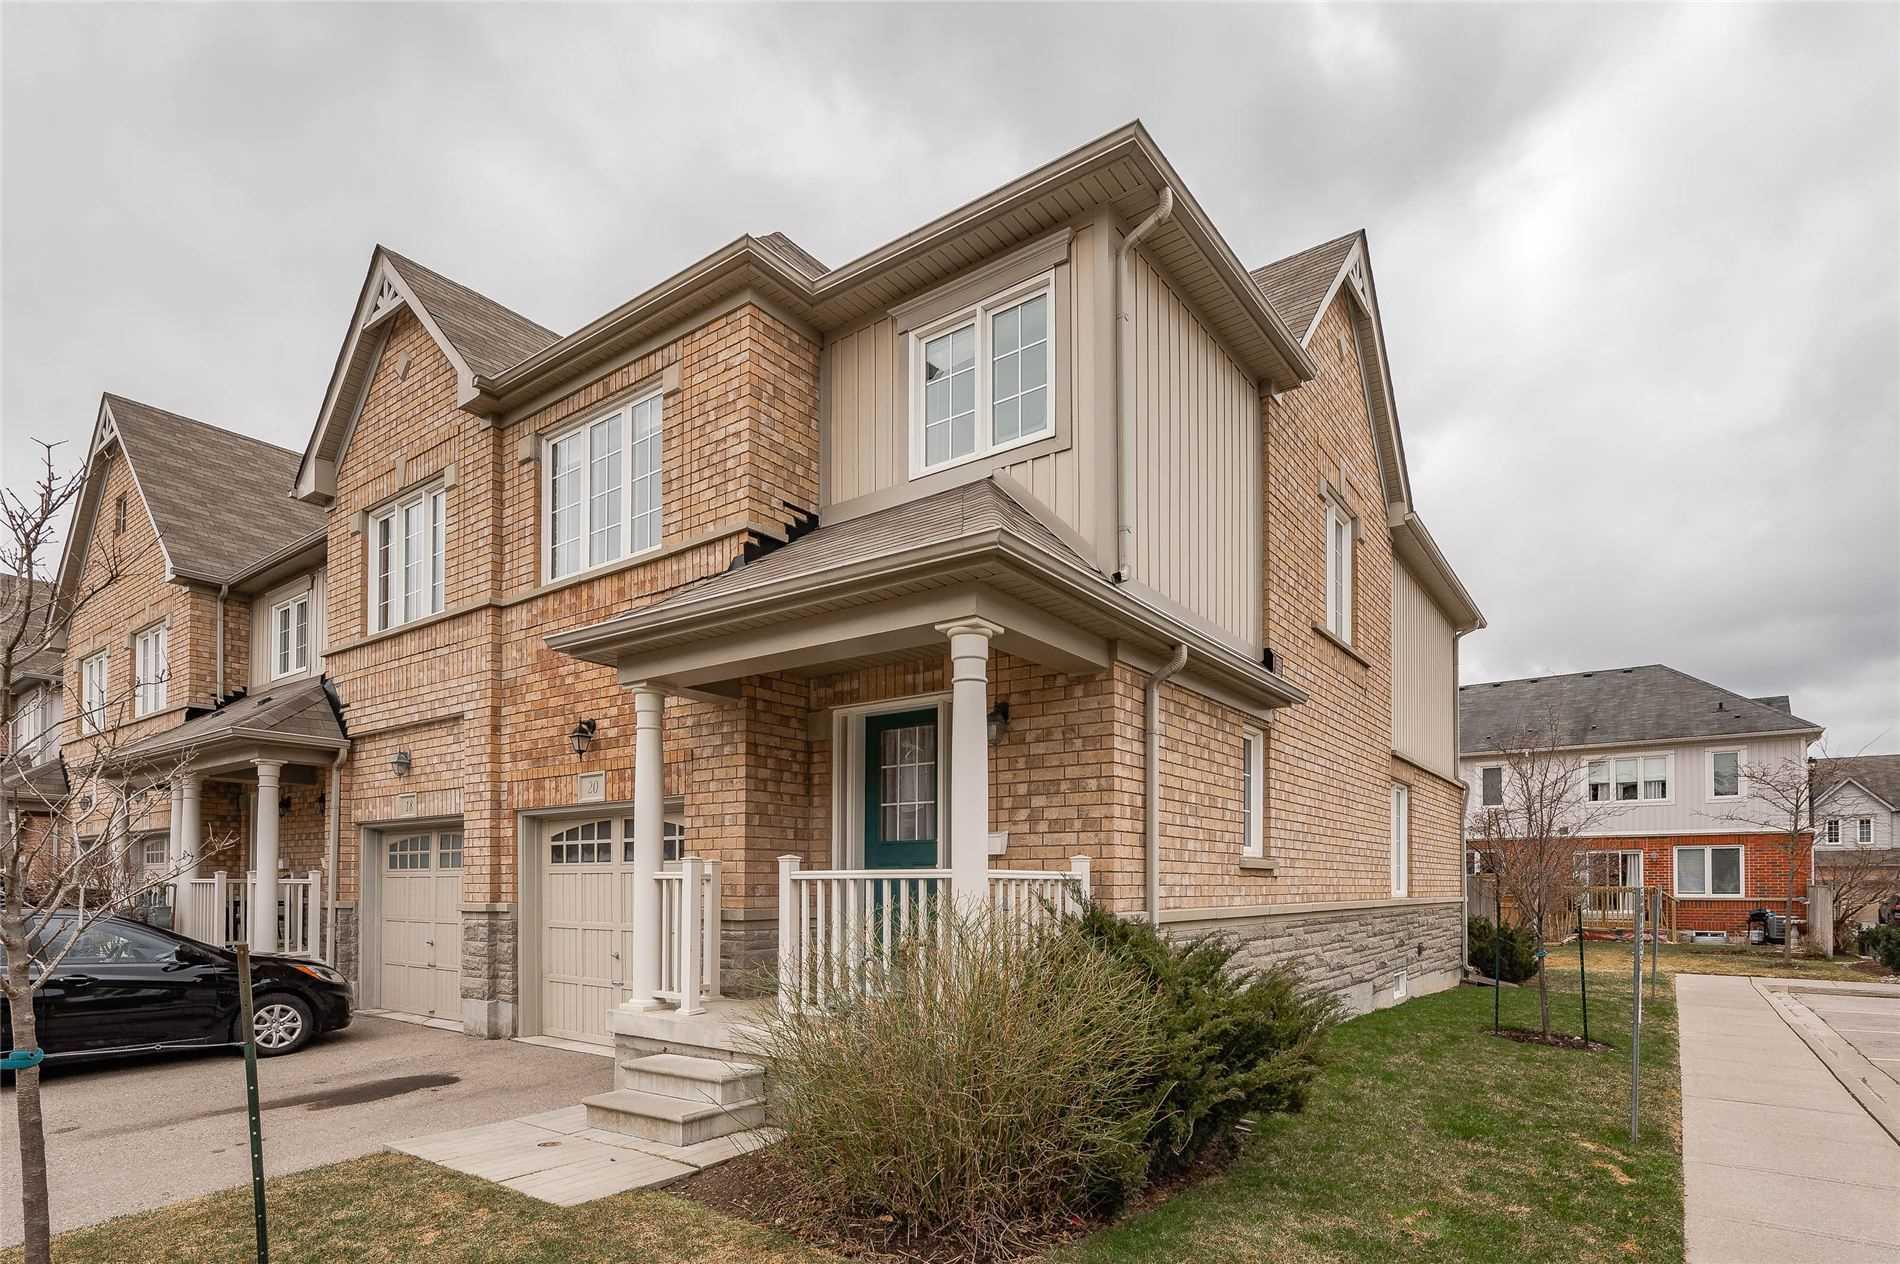 1035 Victoria Rd, Guelph, Ontario N1L0H5, 3 Bedrooms Bedrooms, ,3 BathroomsBathrooms,Condo Townhouse,For Sale,Victoria,X5174458